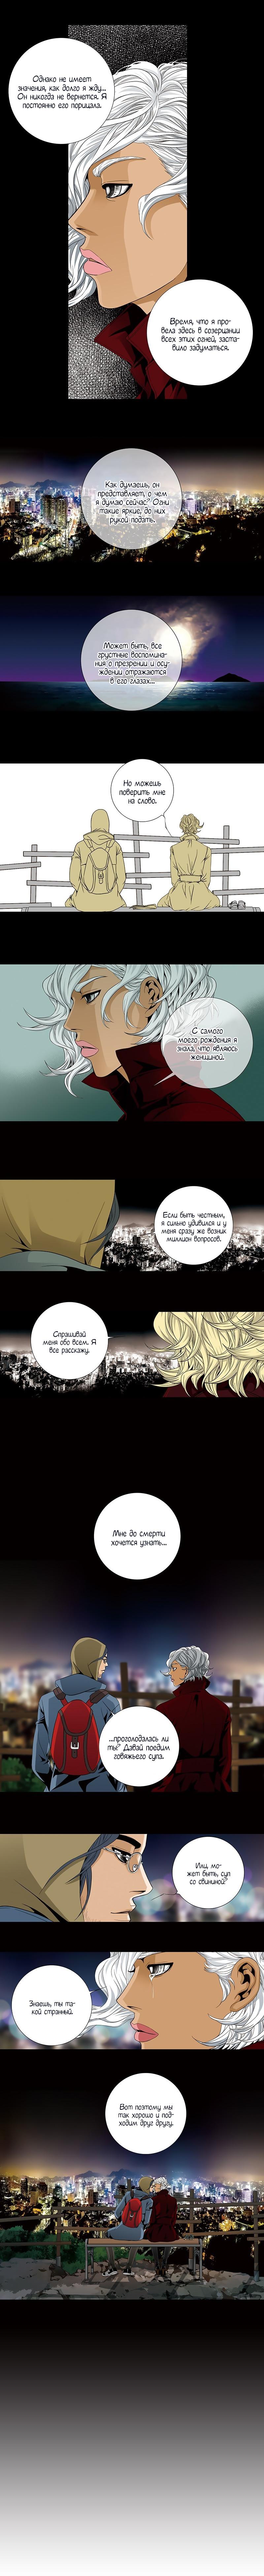 https://r1.ninemanga.com/comics/pic2/29/28573/344349/1512079092704.jpg Page 3